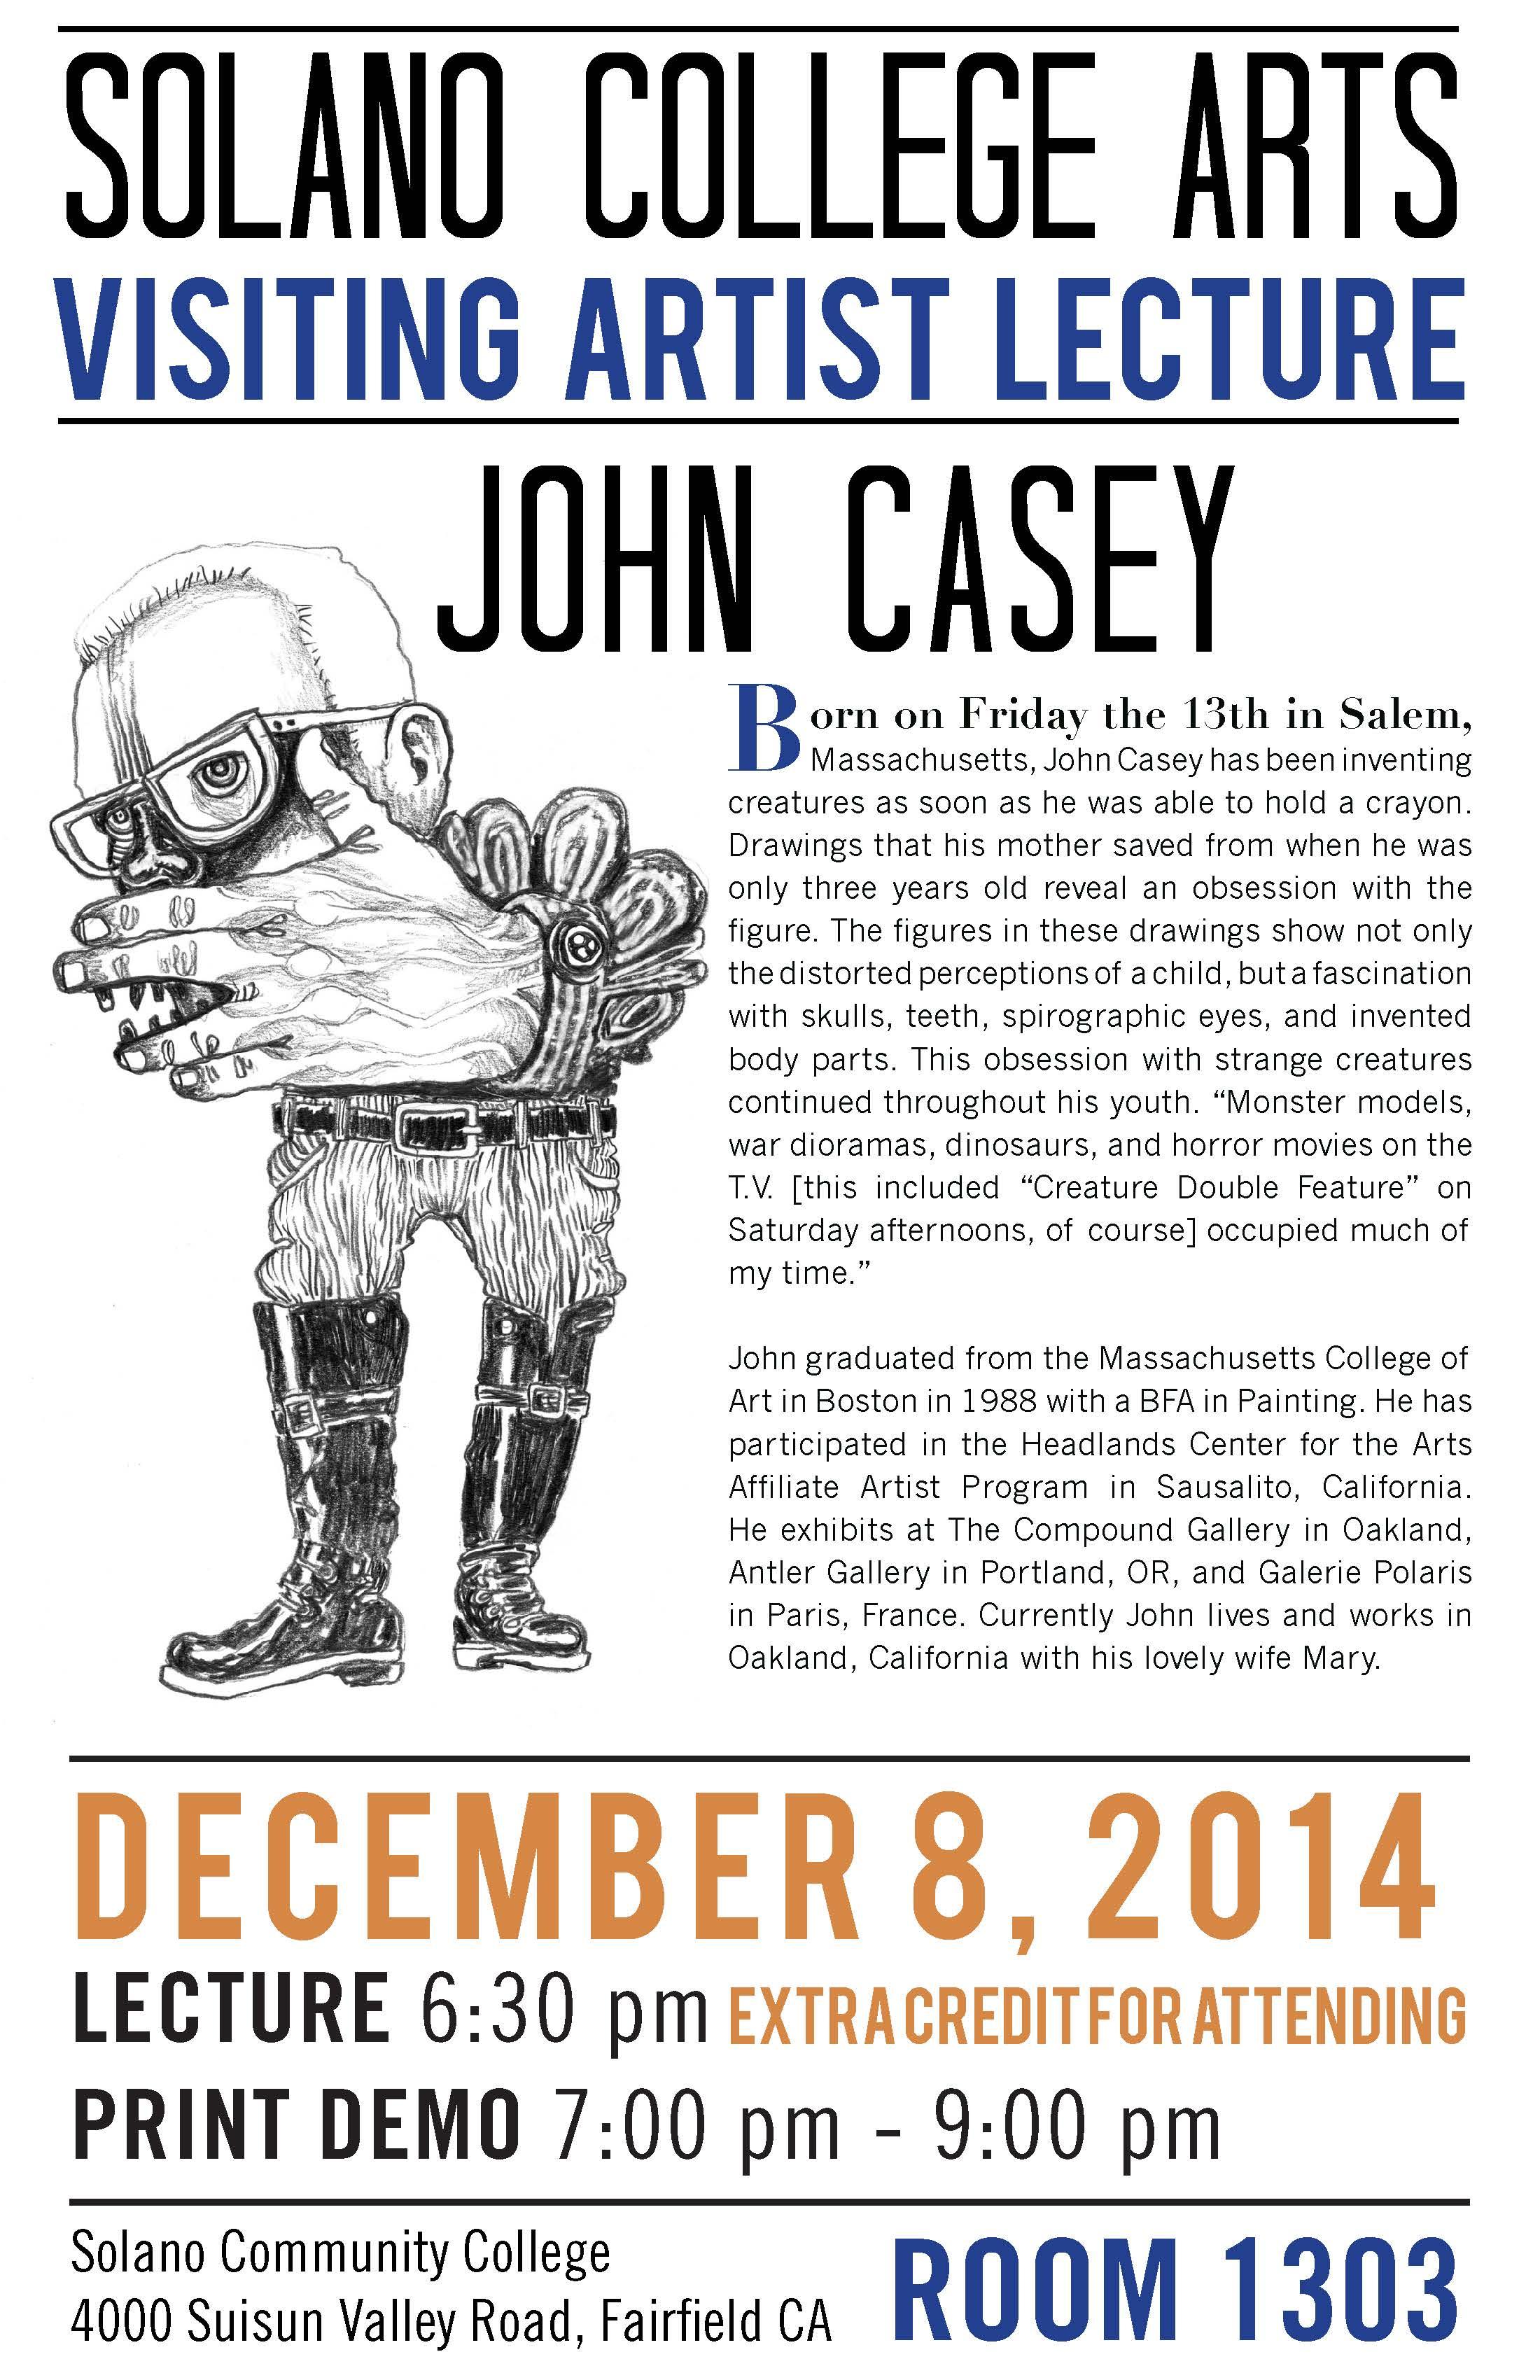 JohnCasey